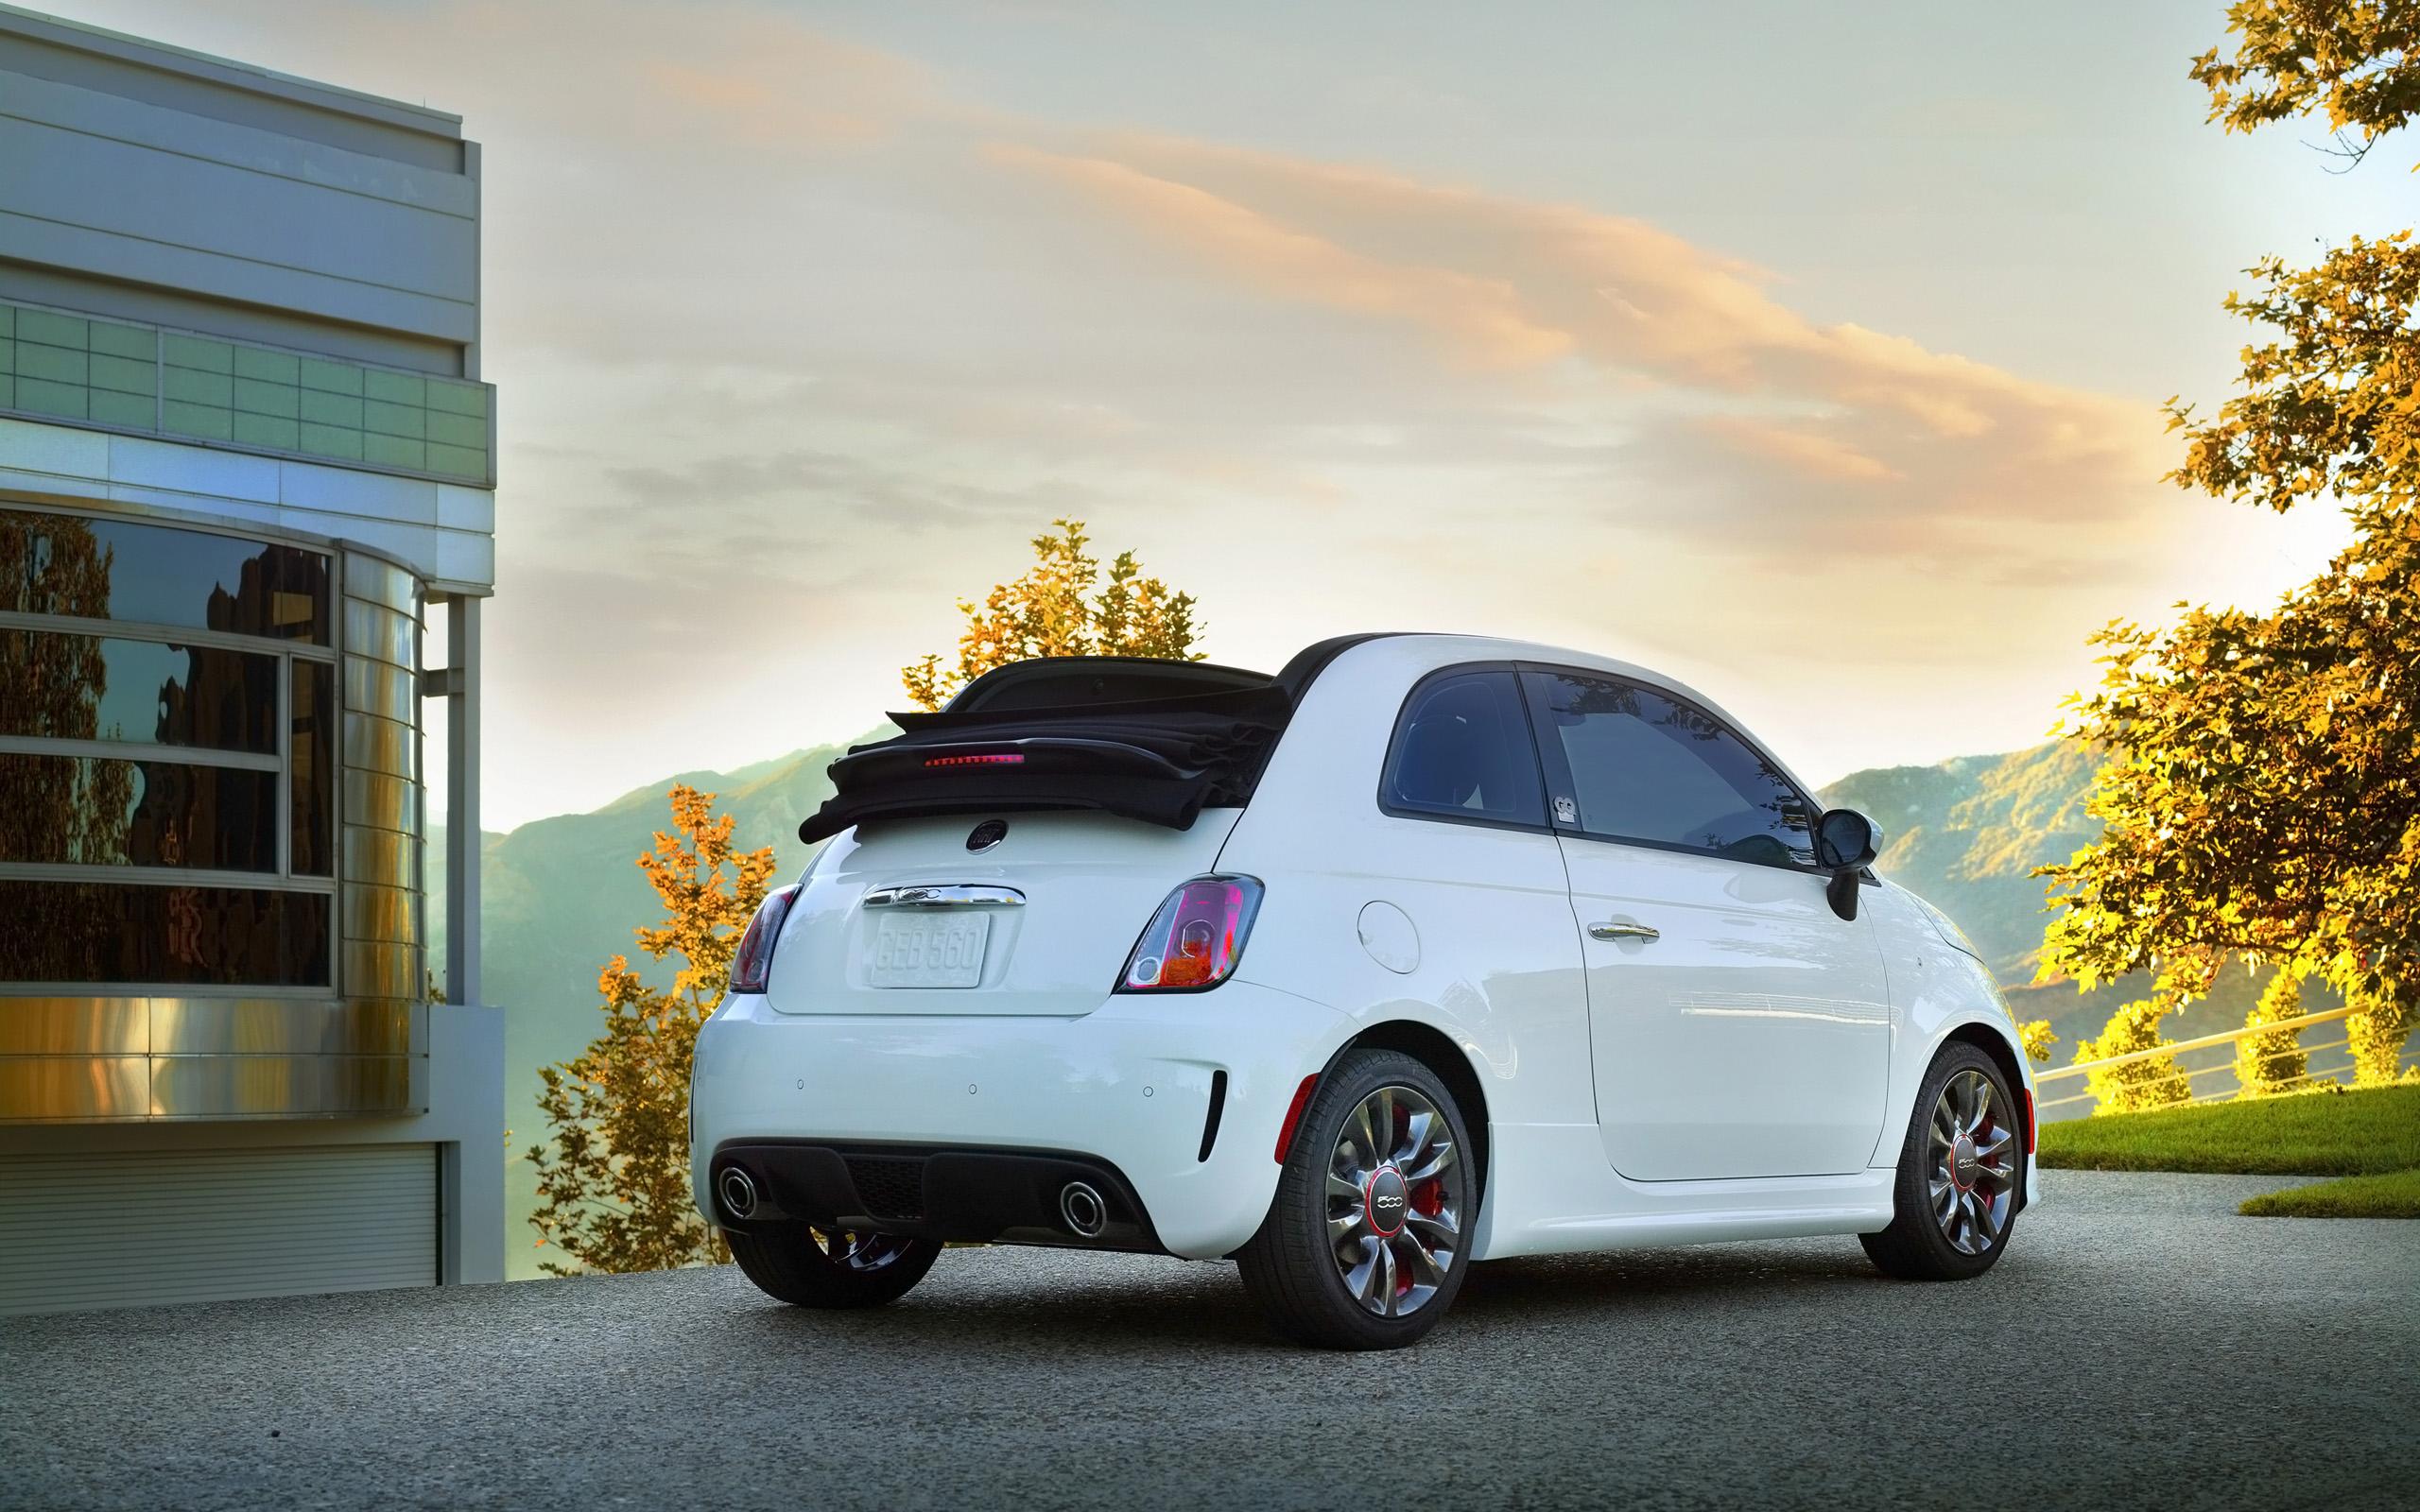 2014 Fiat 500c GQ Edition 3 Wallpaper | HD Car Wallpapers